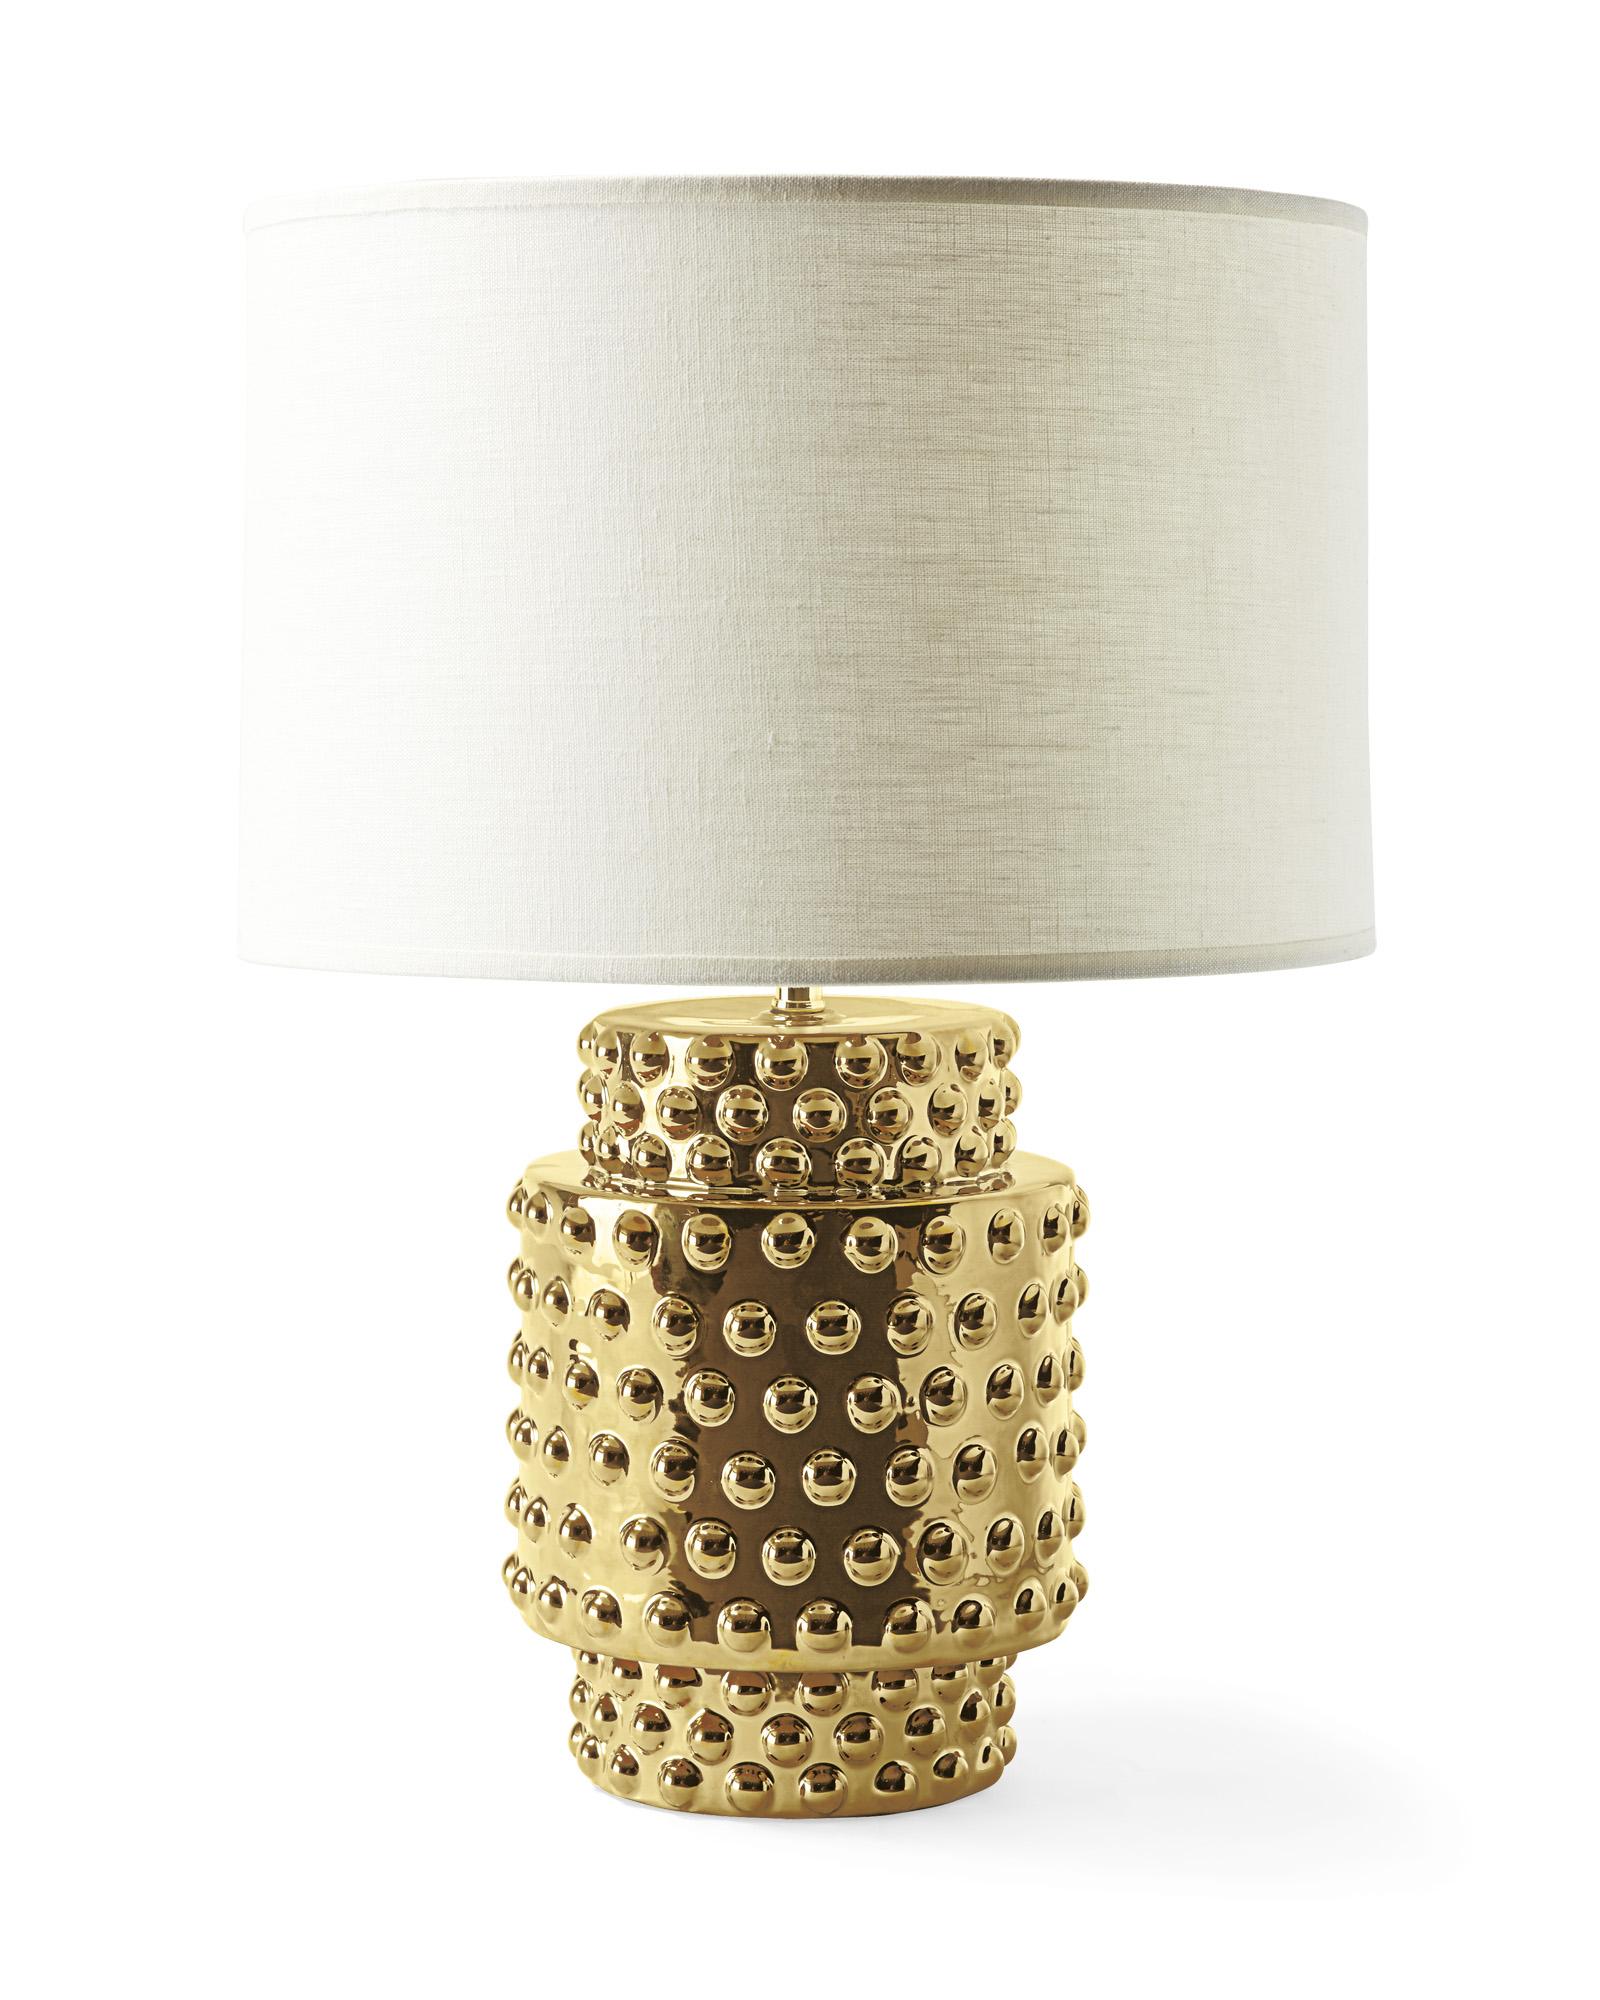 tinsley table lamp / $339